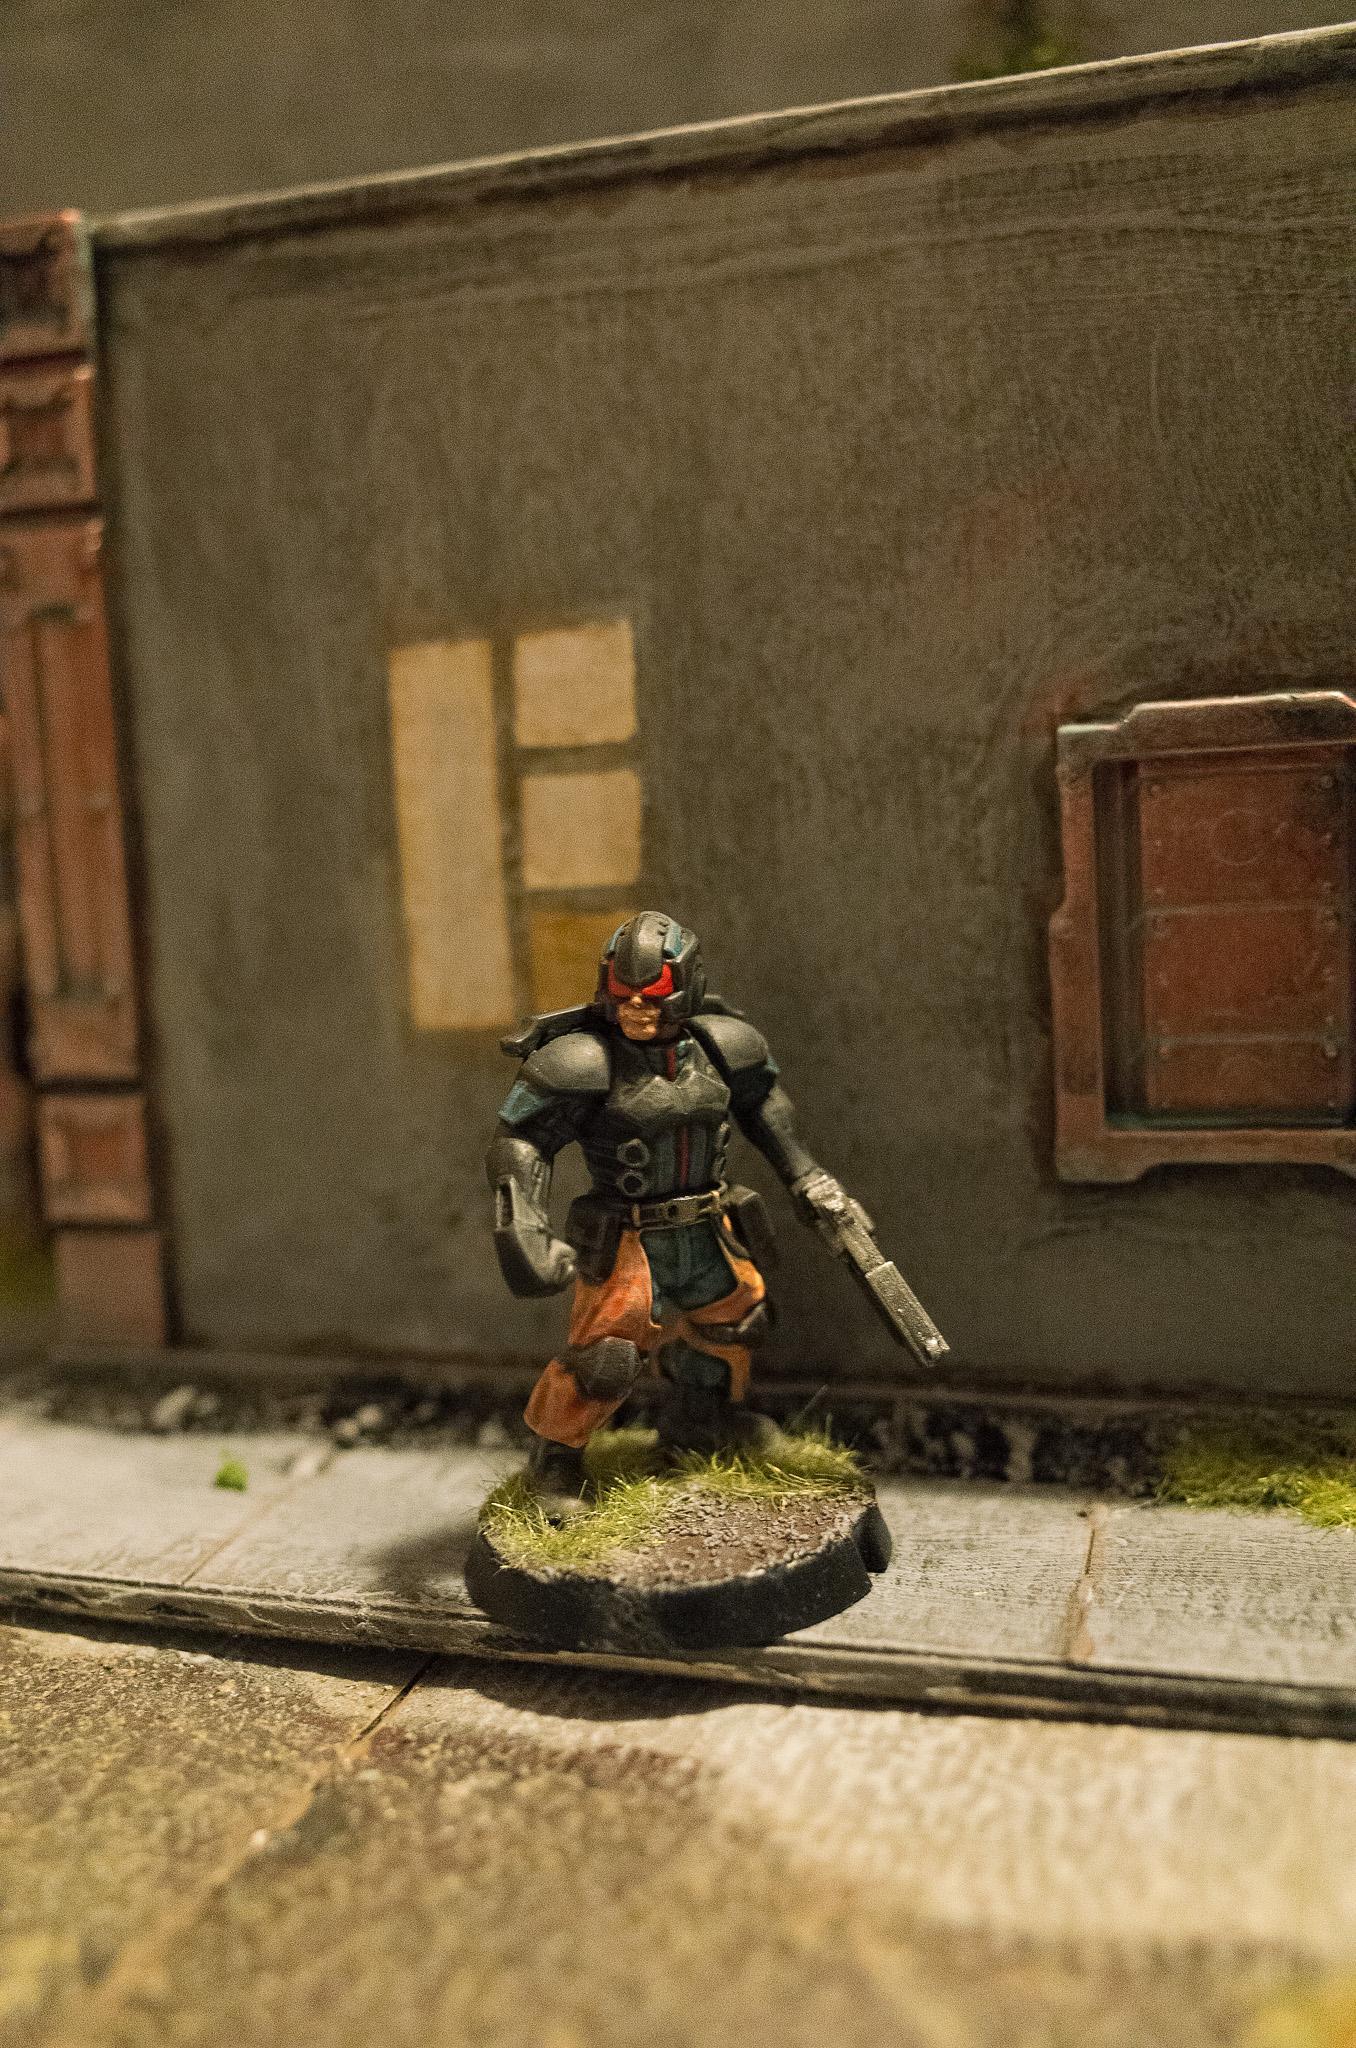 Bot Handler, Buildings, Epirian, Maelstrom's Edge, Terrain